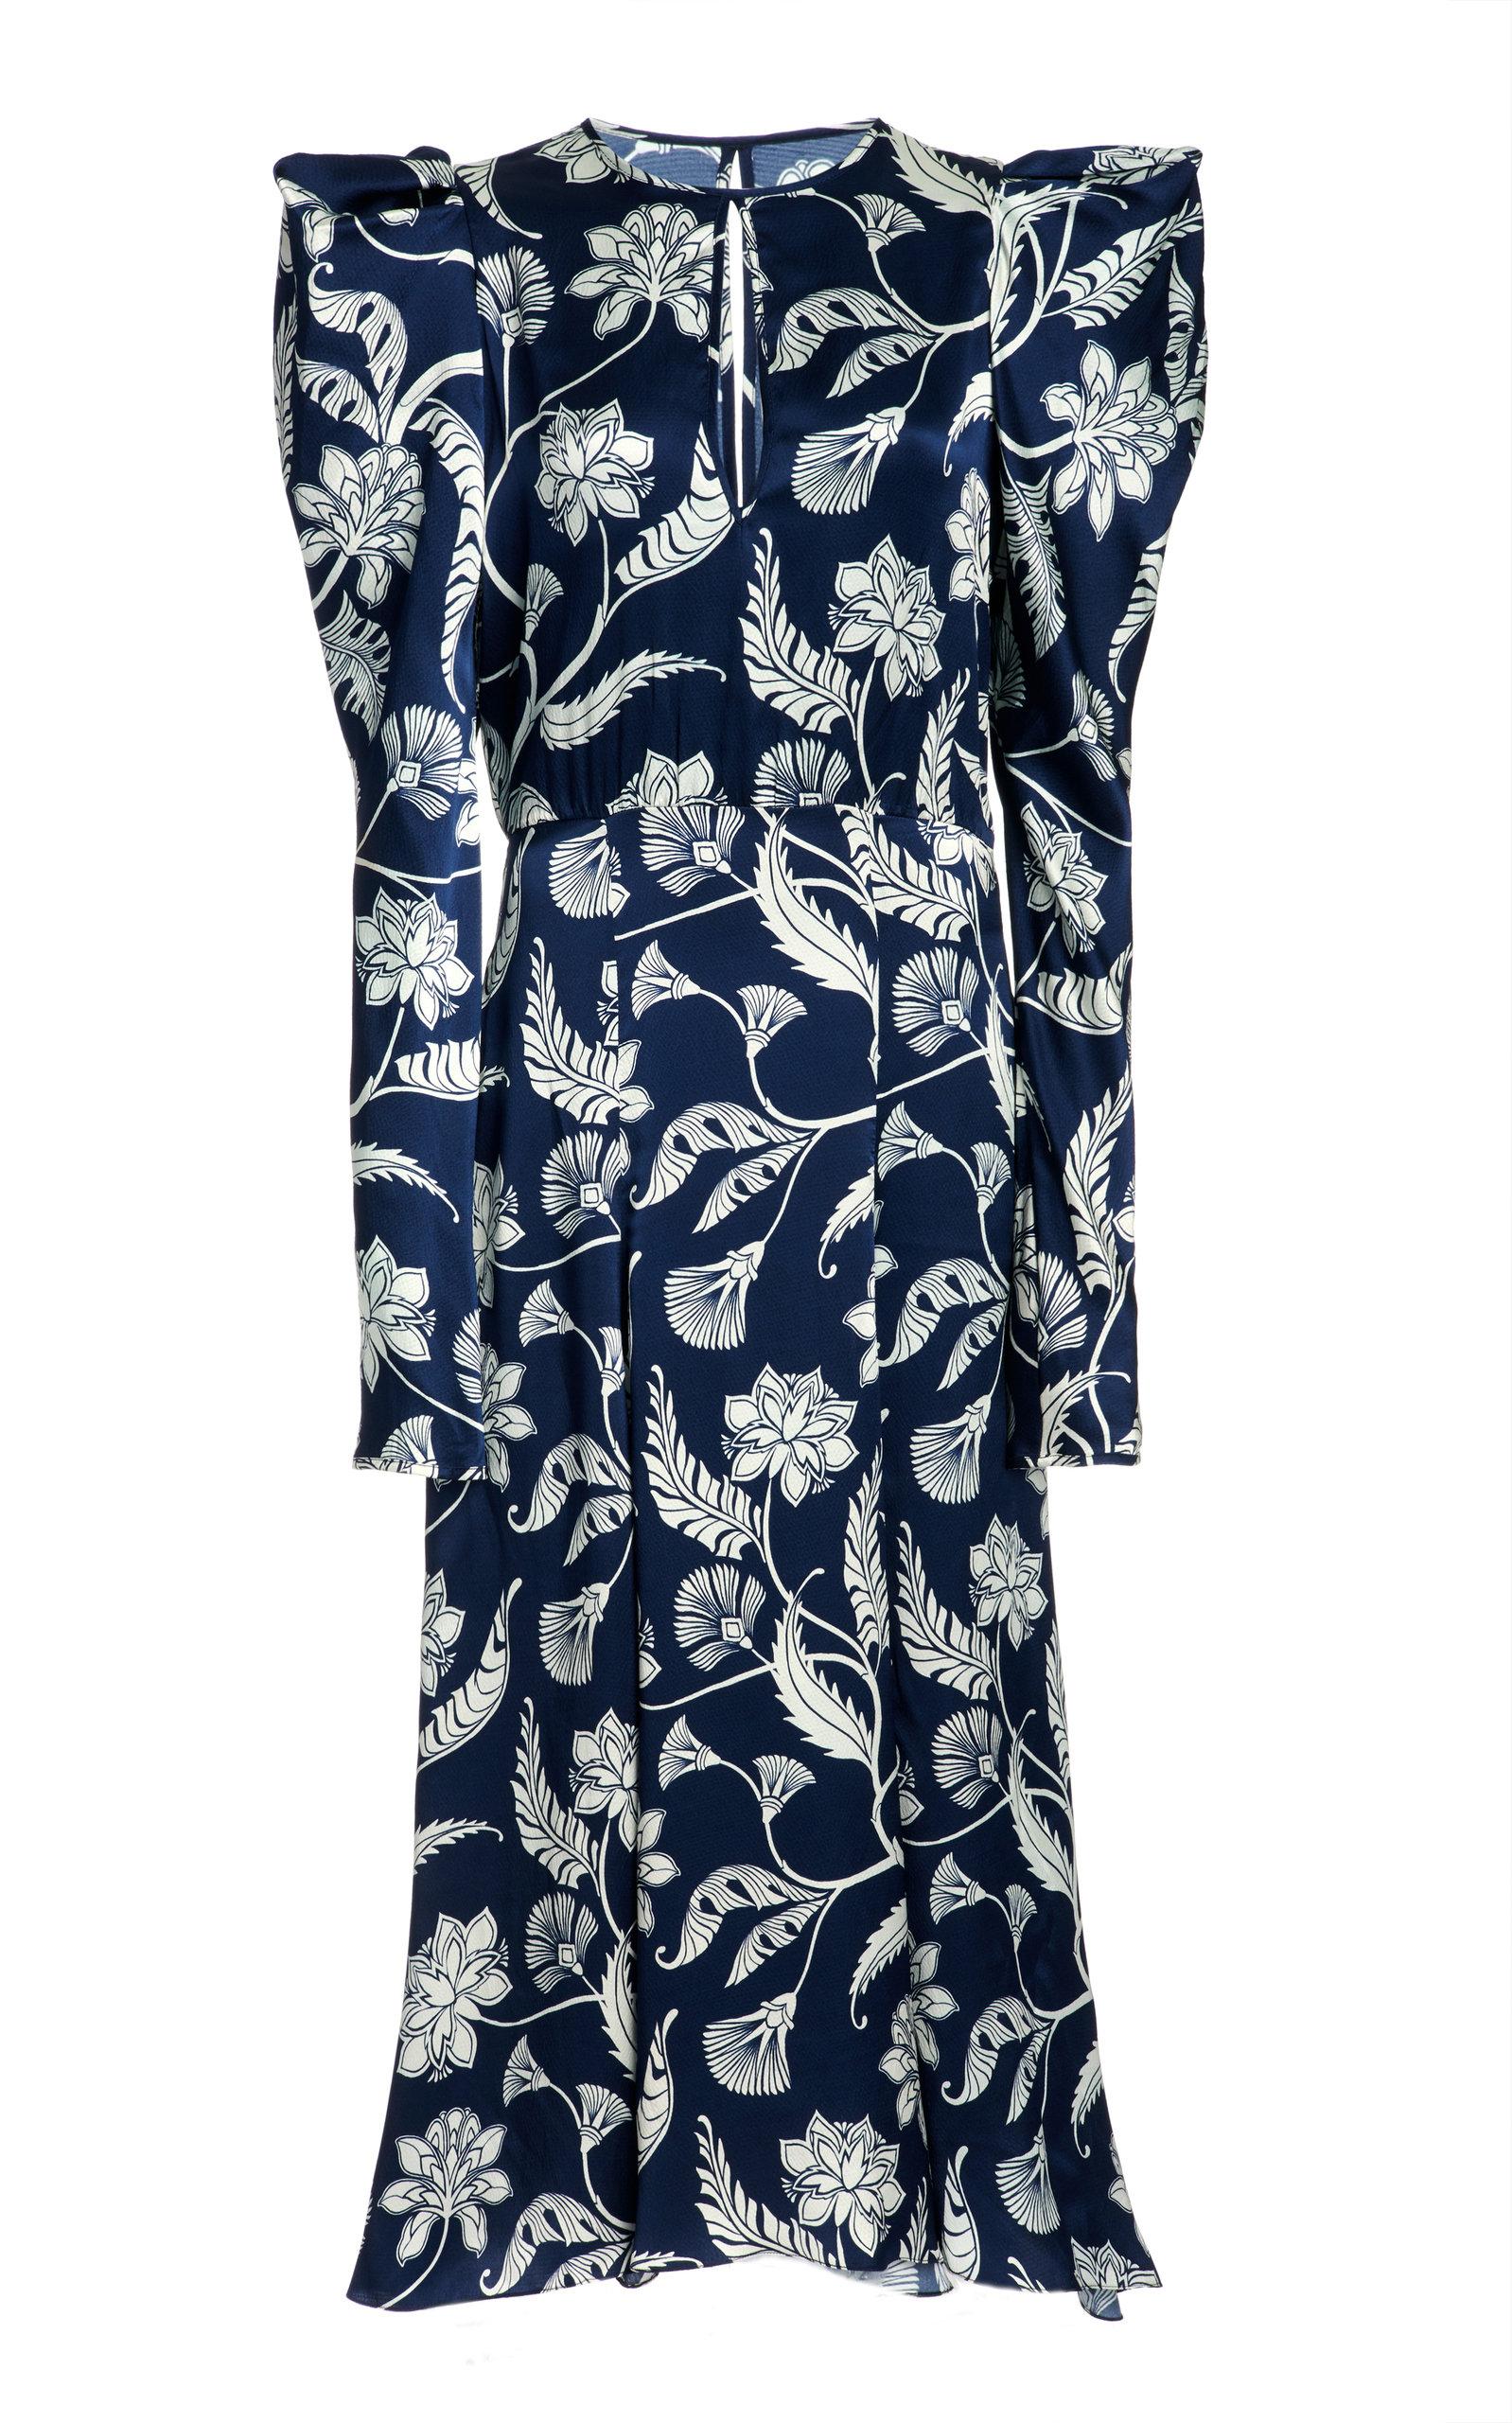 Johanna Ortiz WILD BLUE WONDER PRINTED SILK DRESS